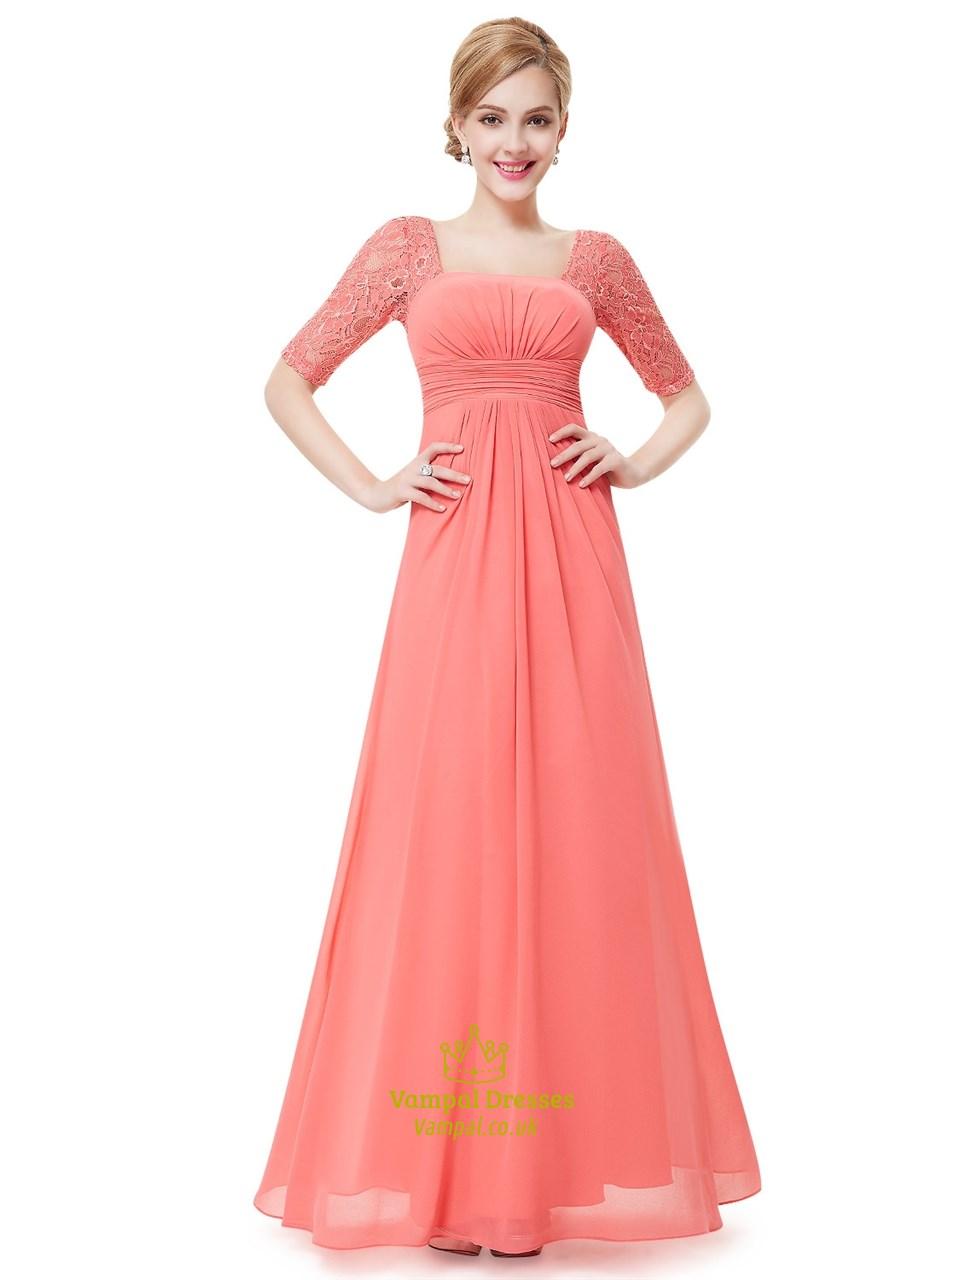 0f1dbc55cc5 Coral Chiffon Floor Length Bridesmaid Dress With Lace Half Sleeves SKU  -NW1459